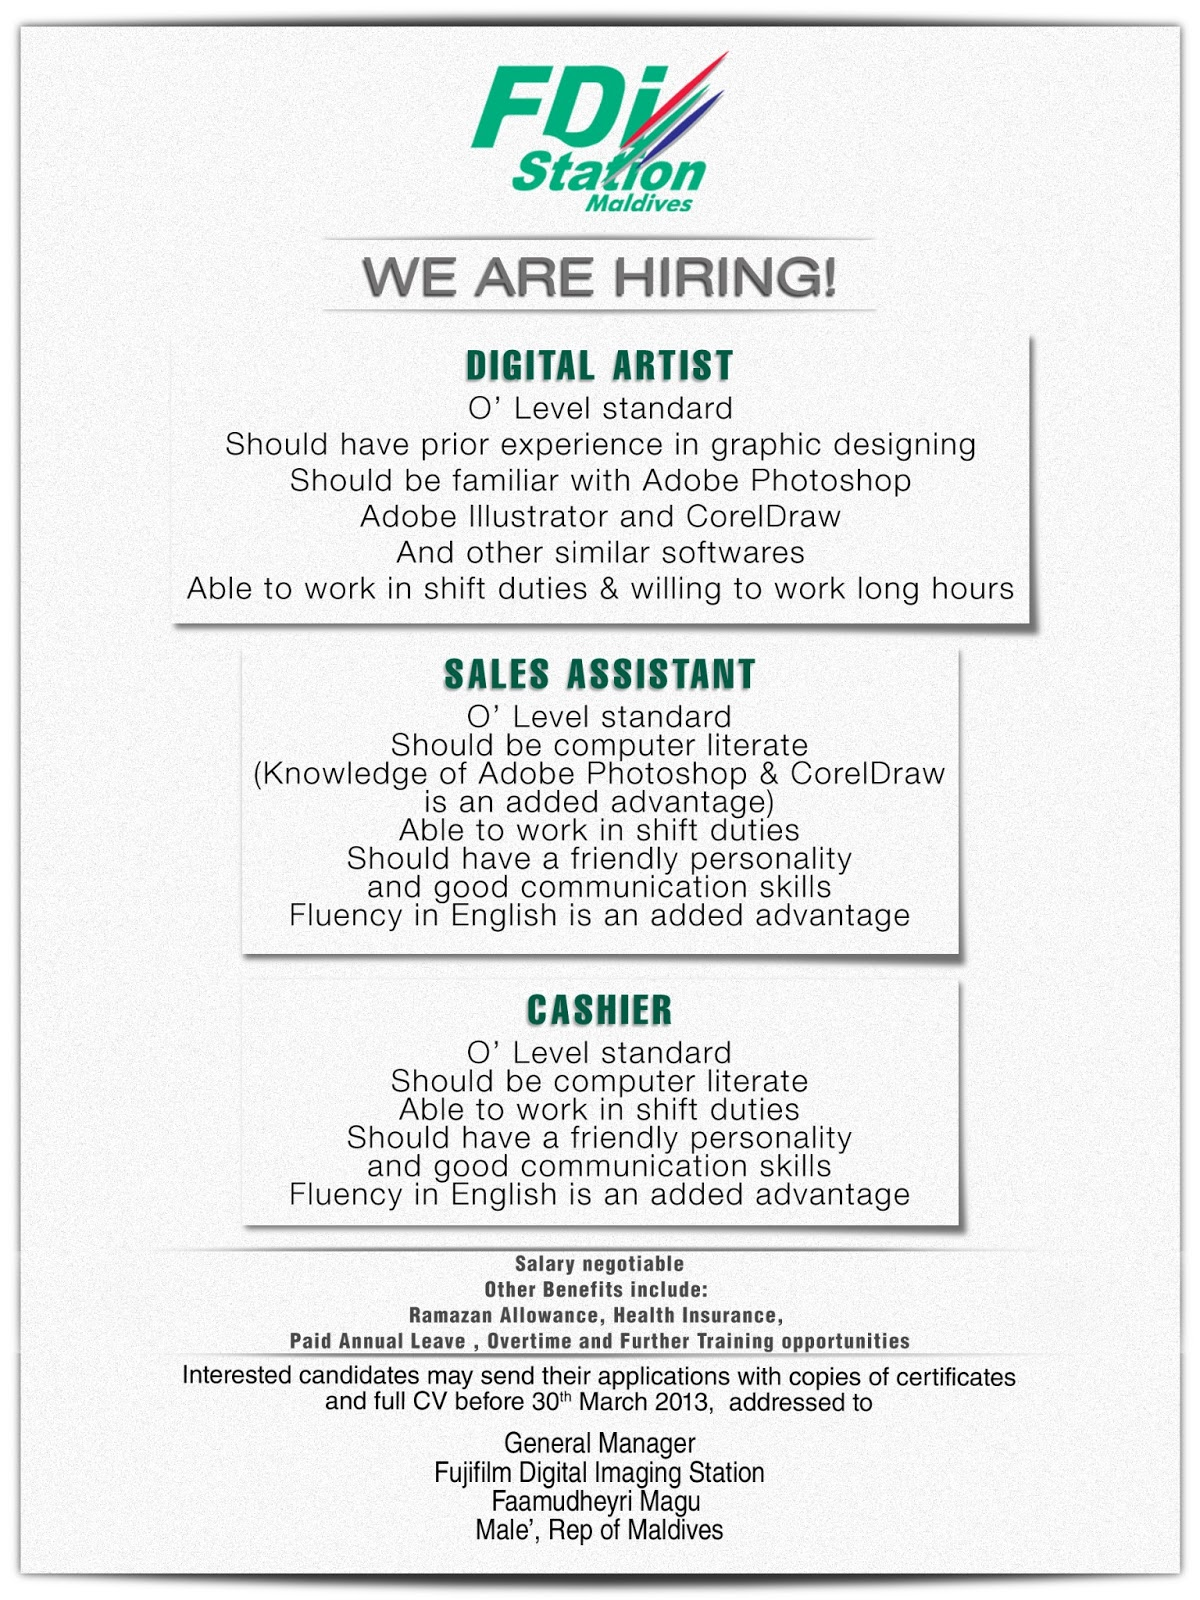 job s assistant jobs in s assistant jobs in